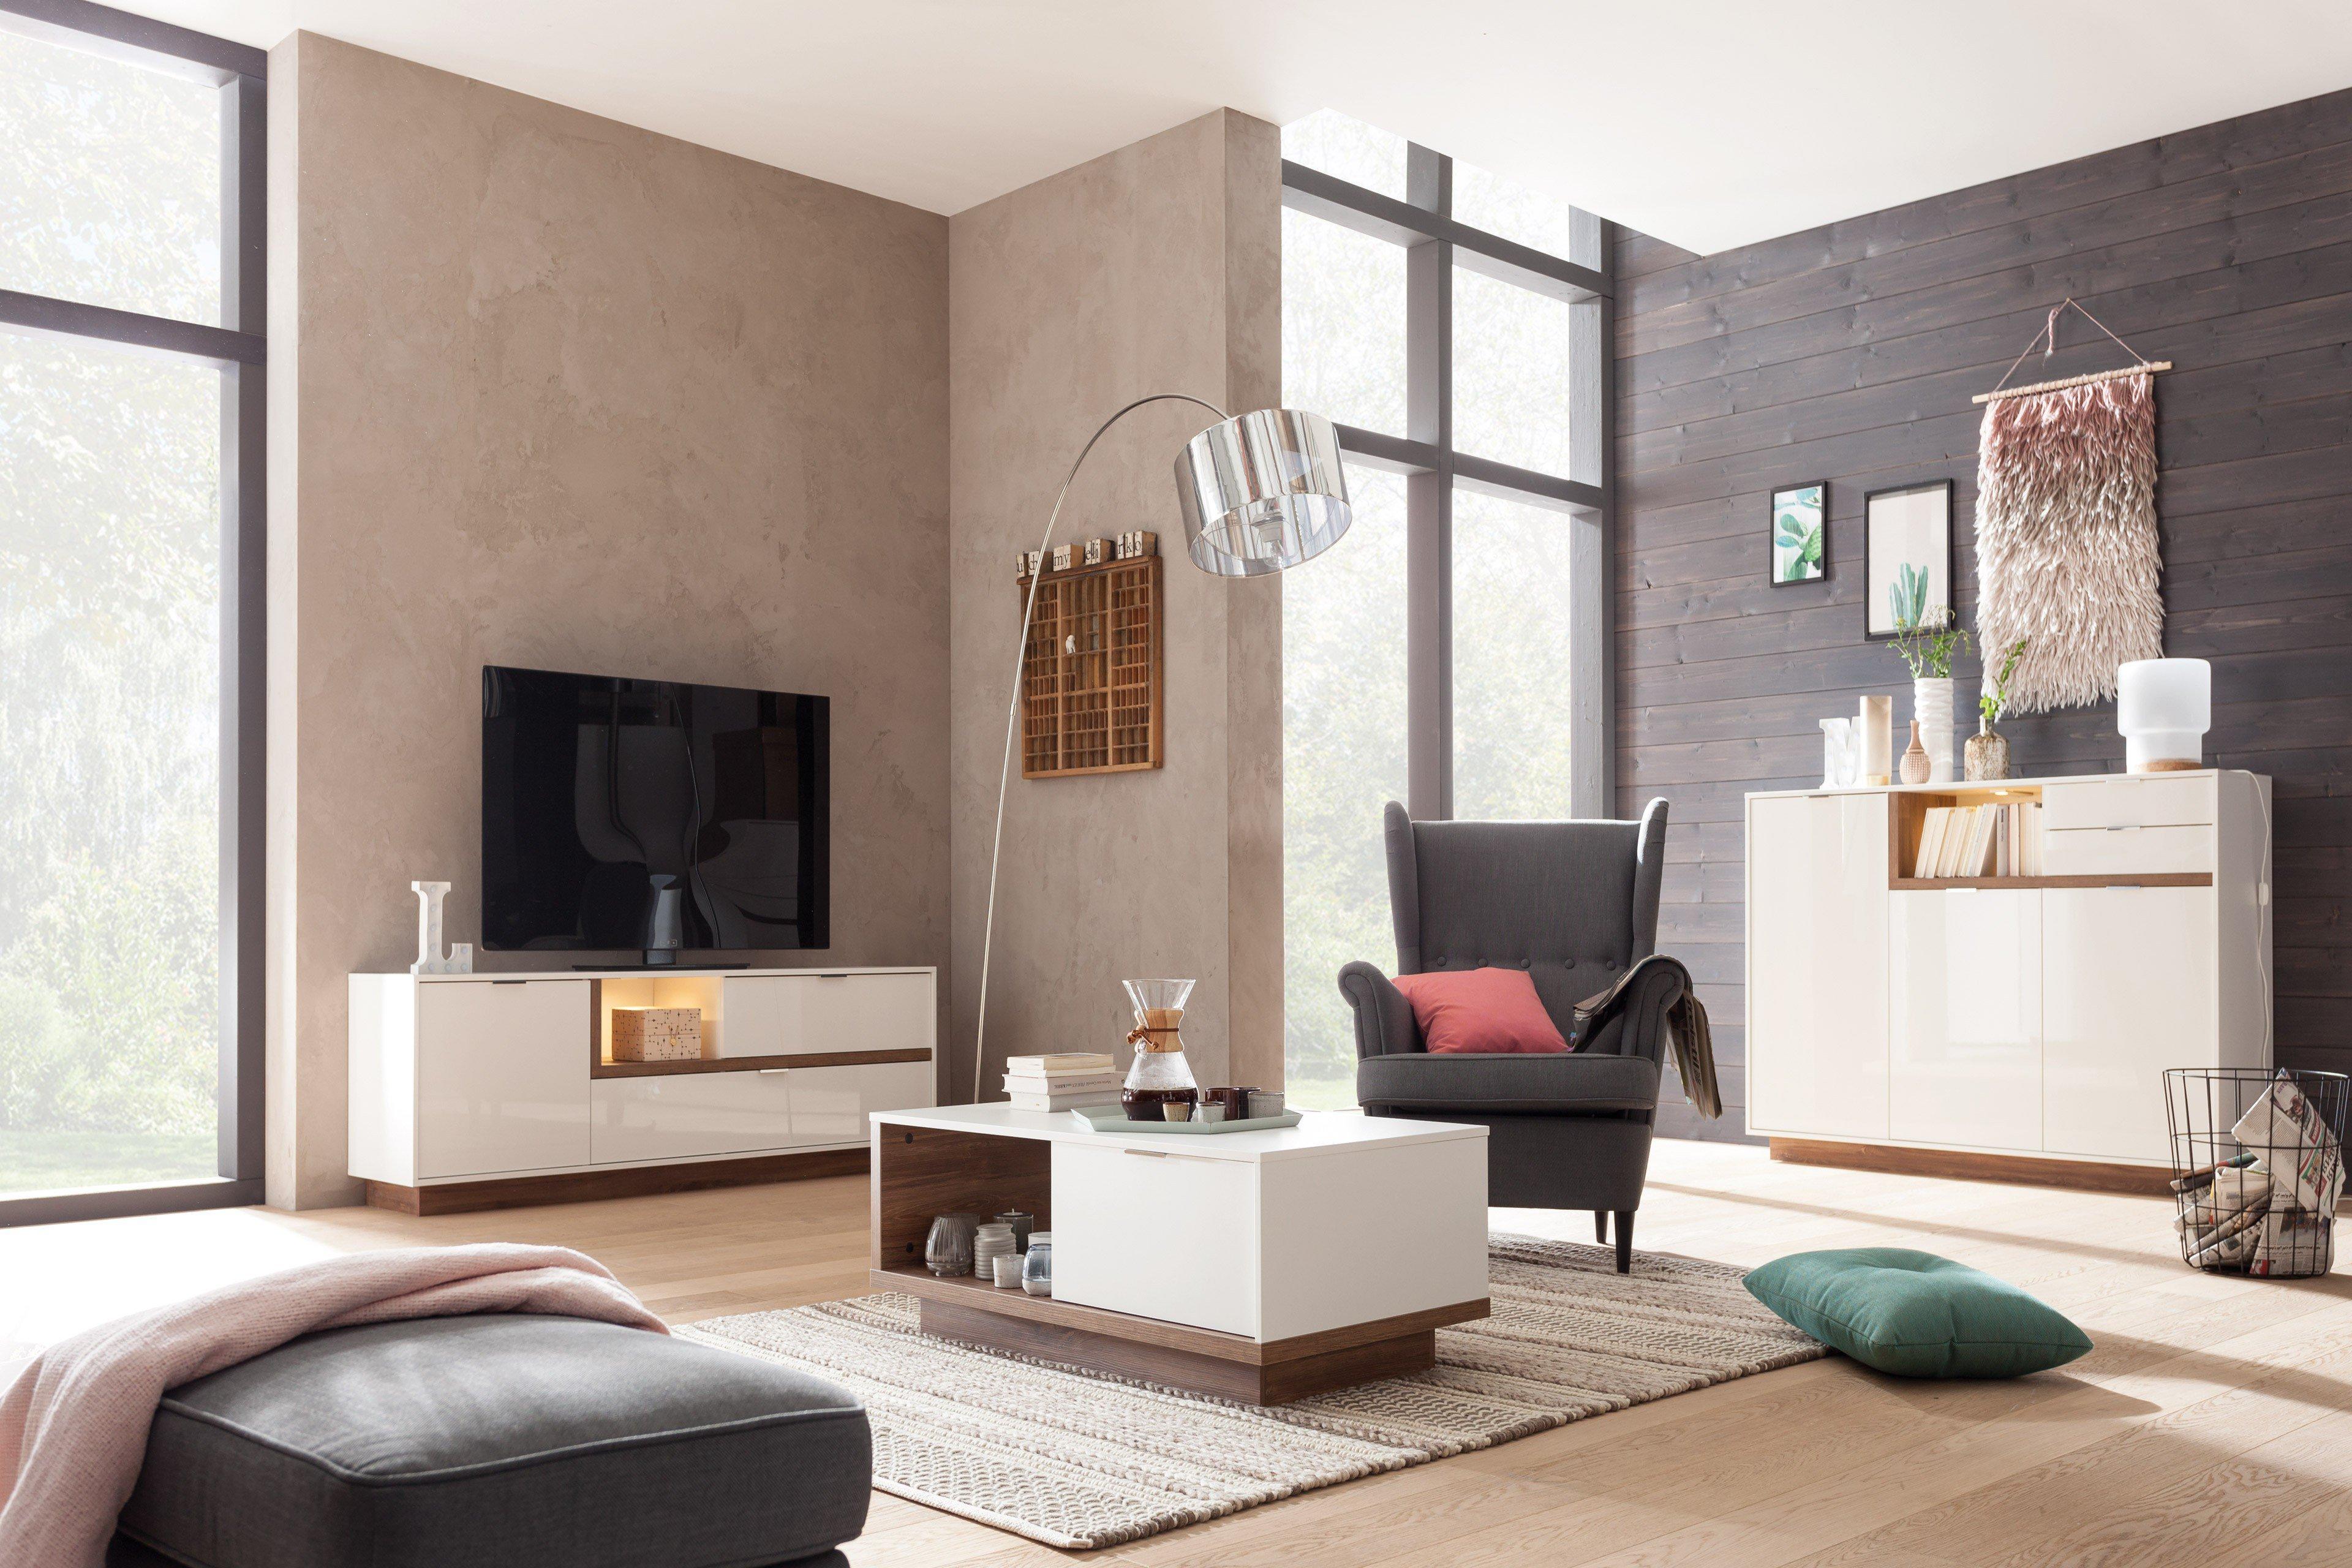 cs schmalm bel lowboard my ell wei stirling eiche m bel letz ihr online shop. Black Bedroom Furniture Sets. Home Design Ideas